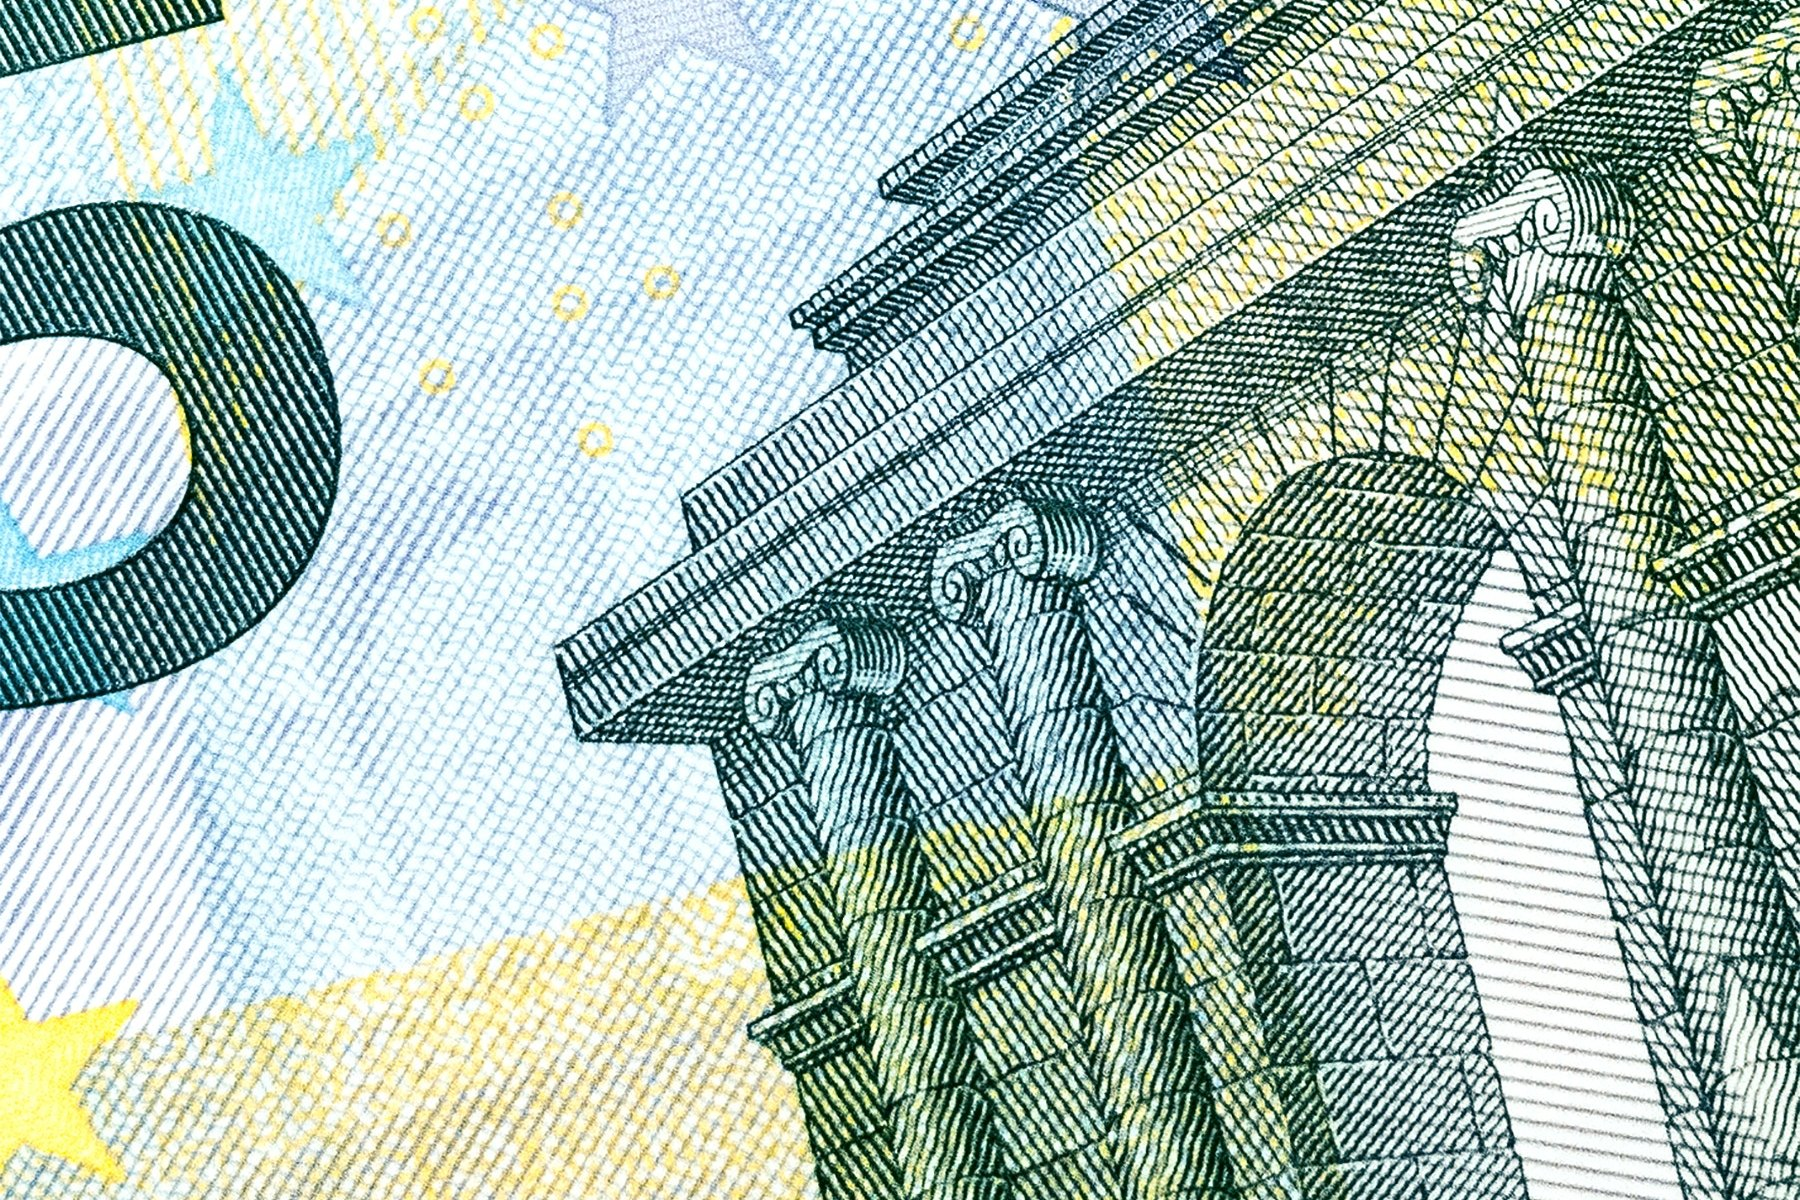 debt-detox-free